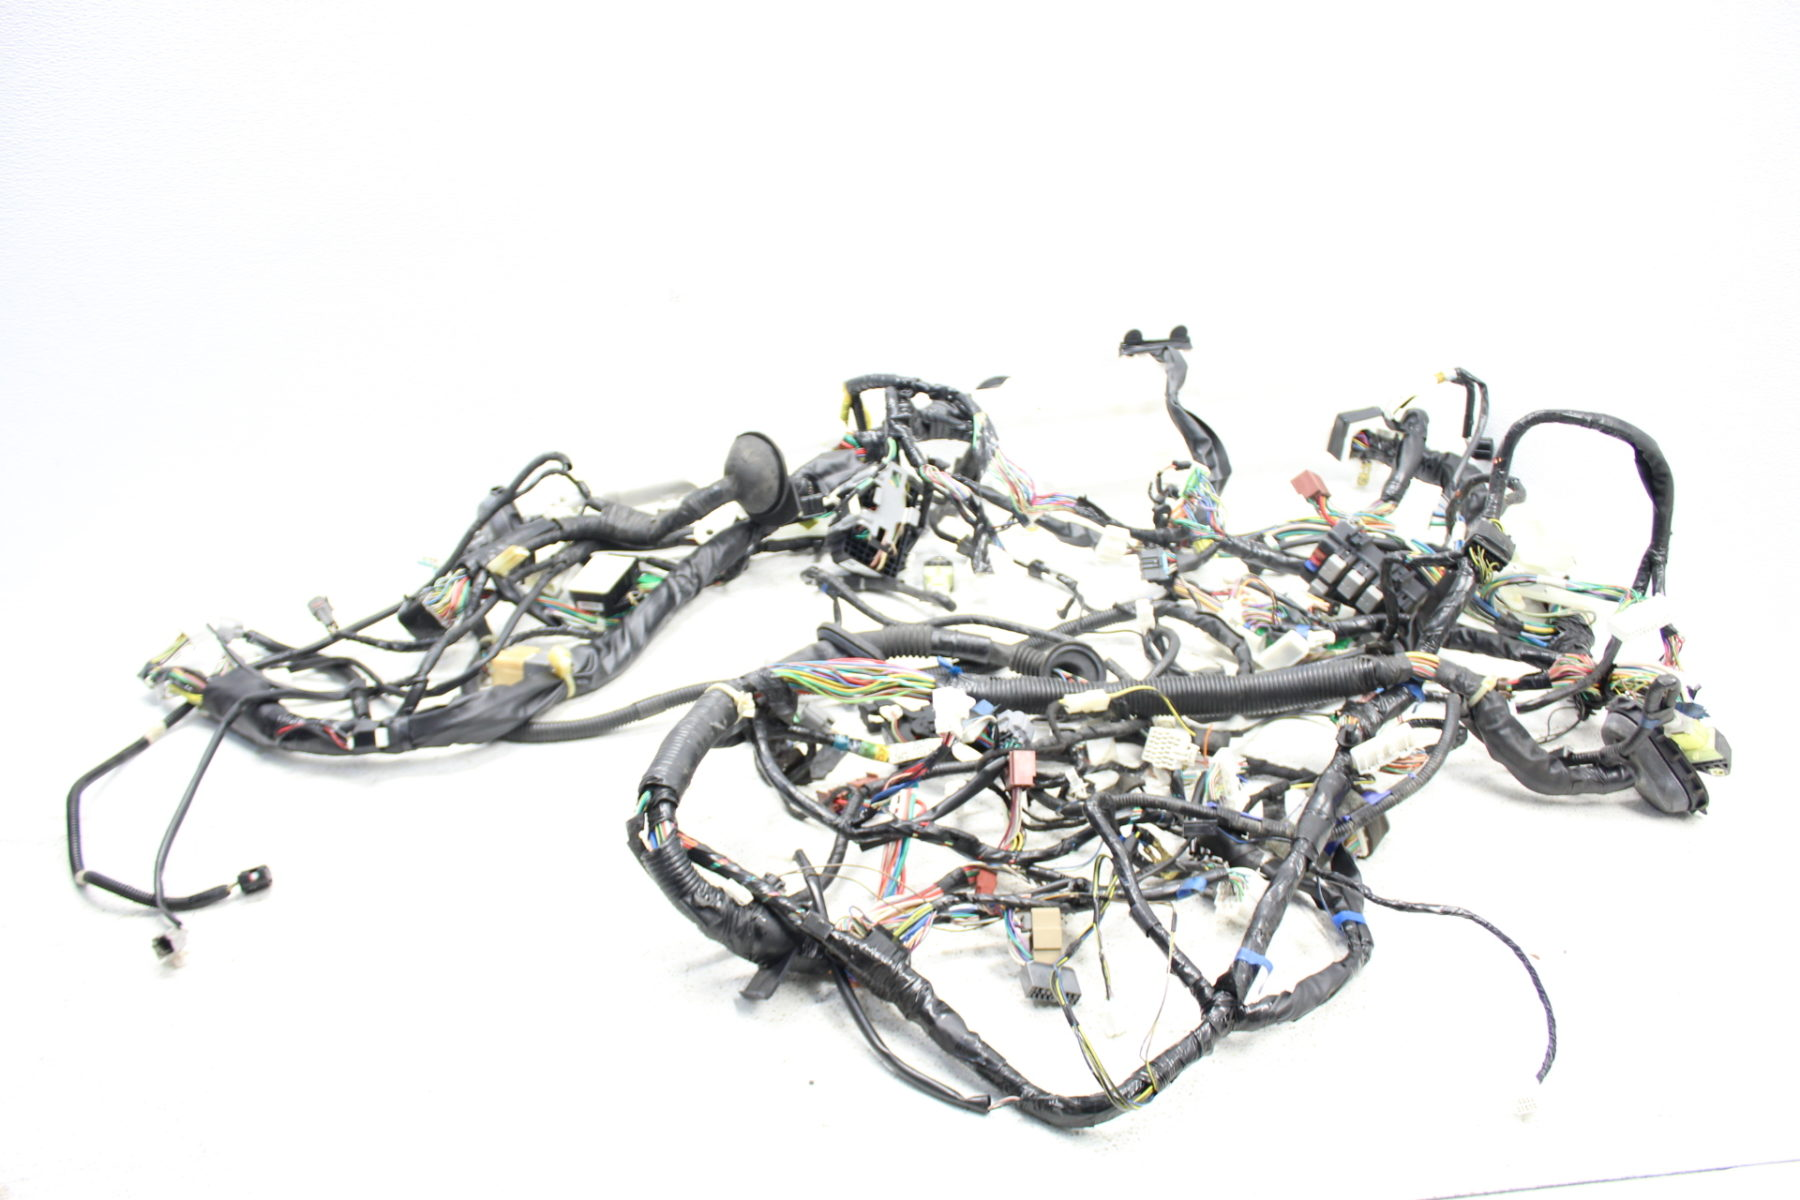 11 14 2011 2014 subaru impreza wrx sti dash board wiring. Black Bedroom Furniture Sets. Home Design Ideas